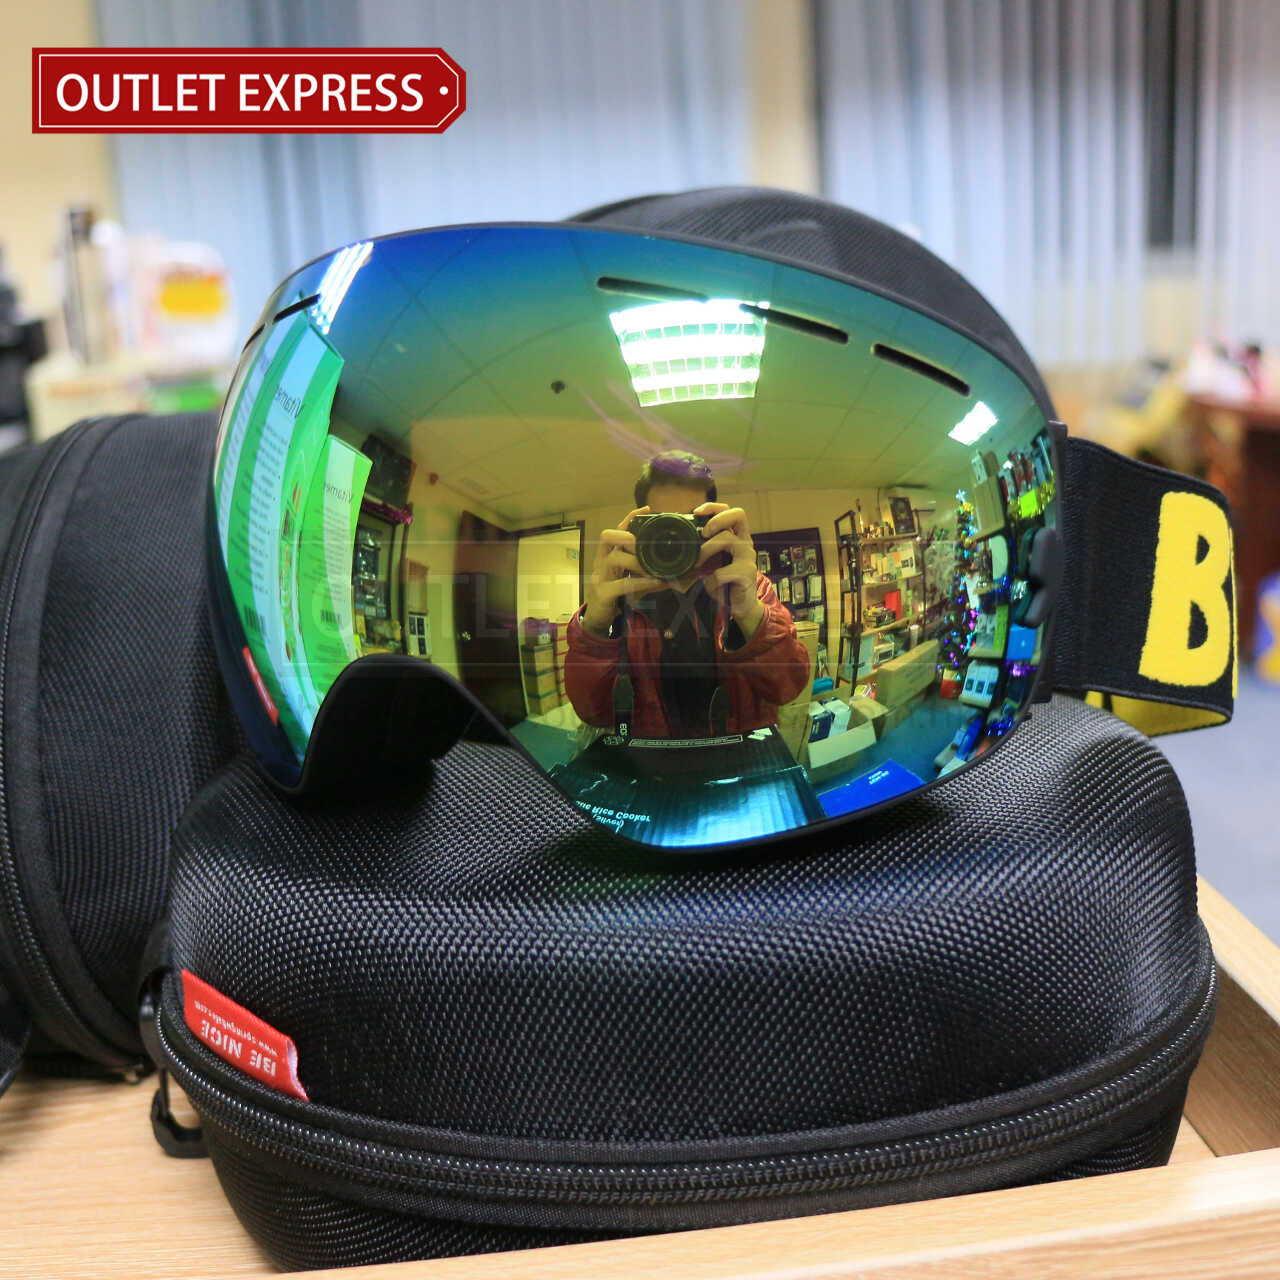 BENICE 大球面雙層防霧滑雪鏡 | 可配合眼鏡用 經典款-Outlet Express HK生活百貨城實拍相片